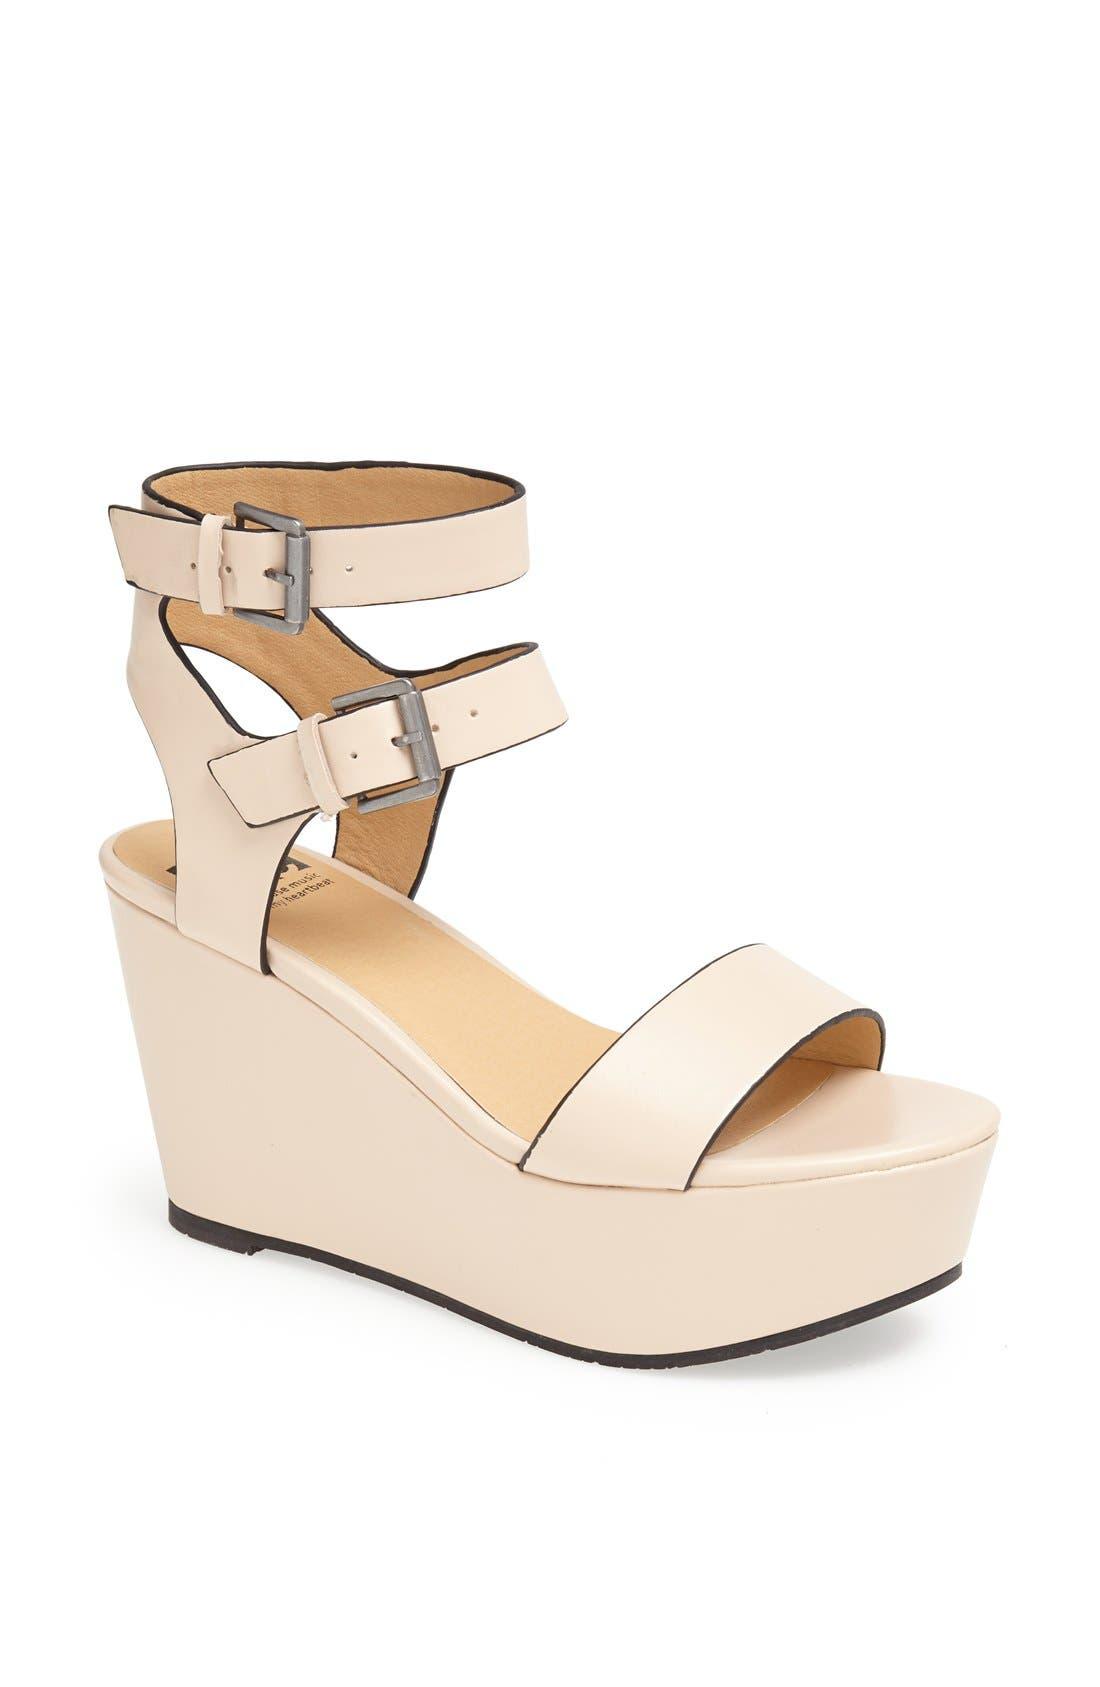 Main Image - BC Footwear 'Caught Up' Sandal